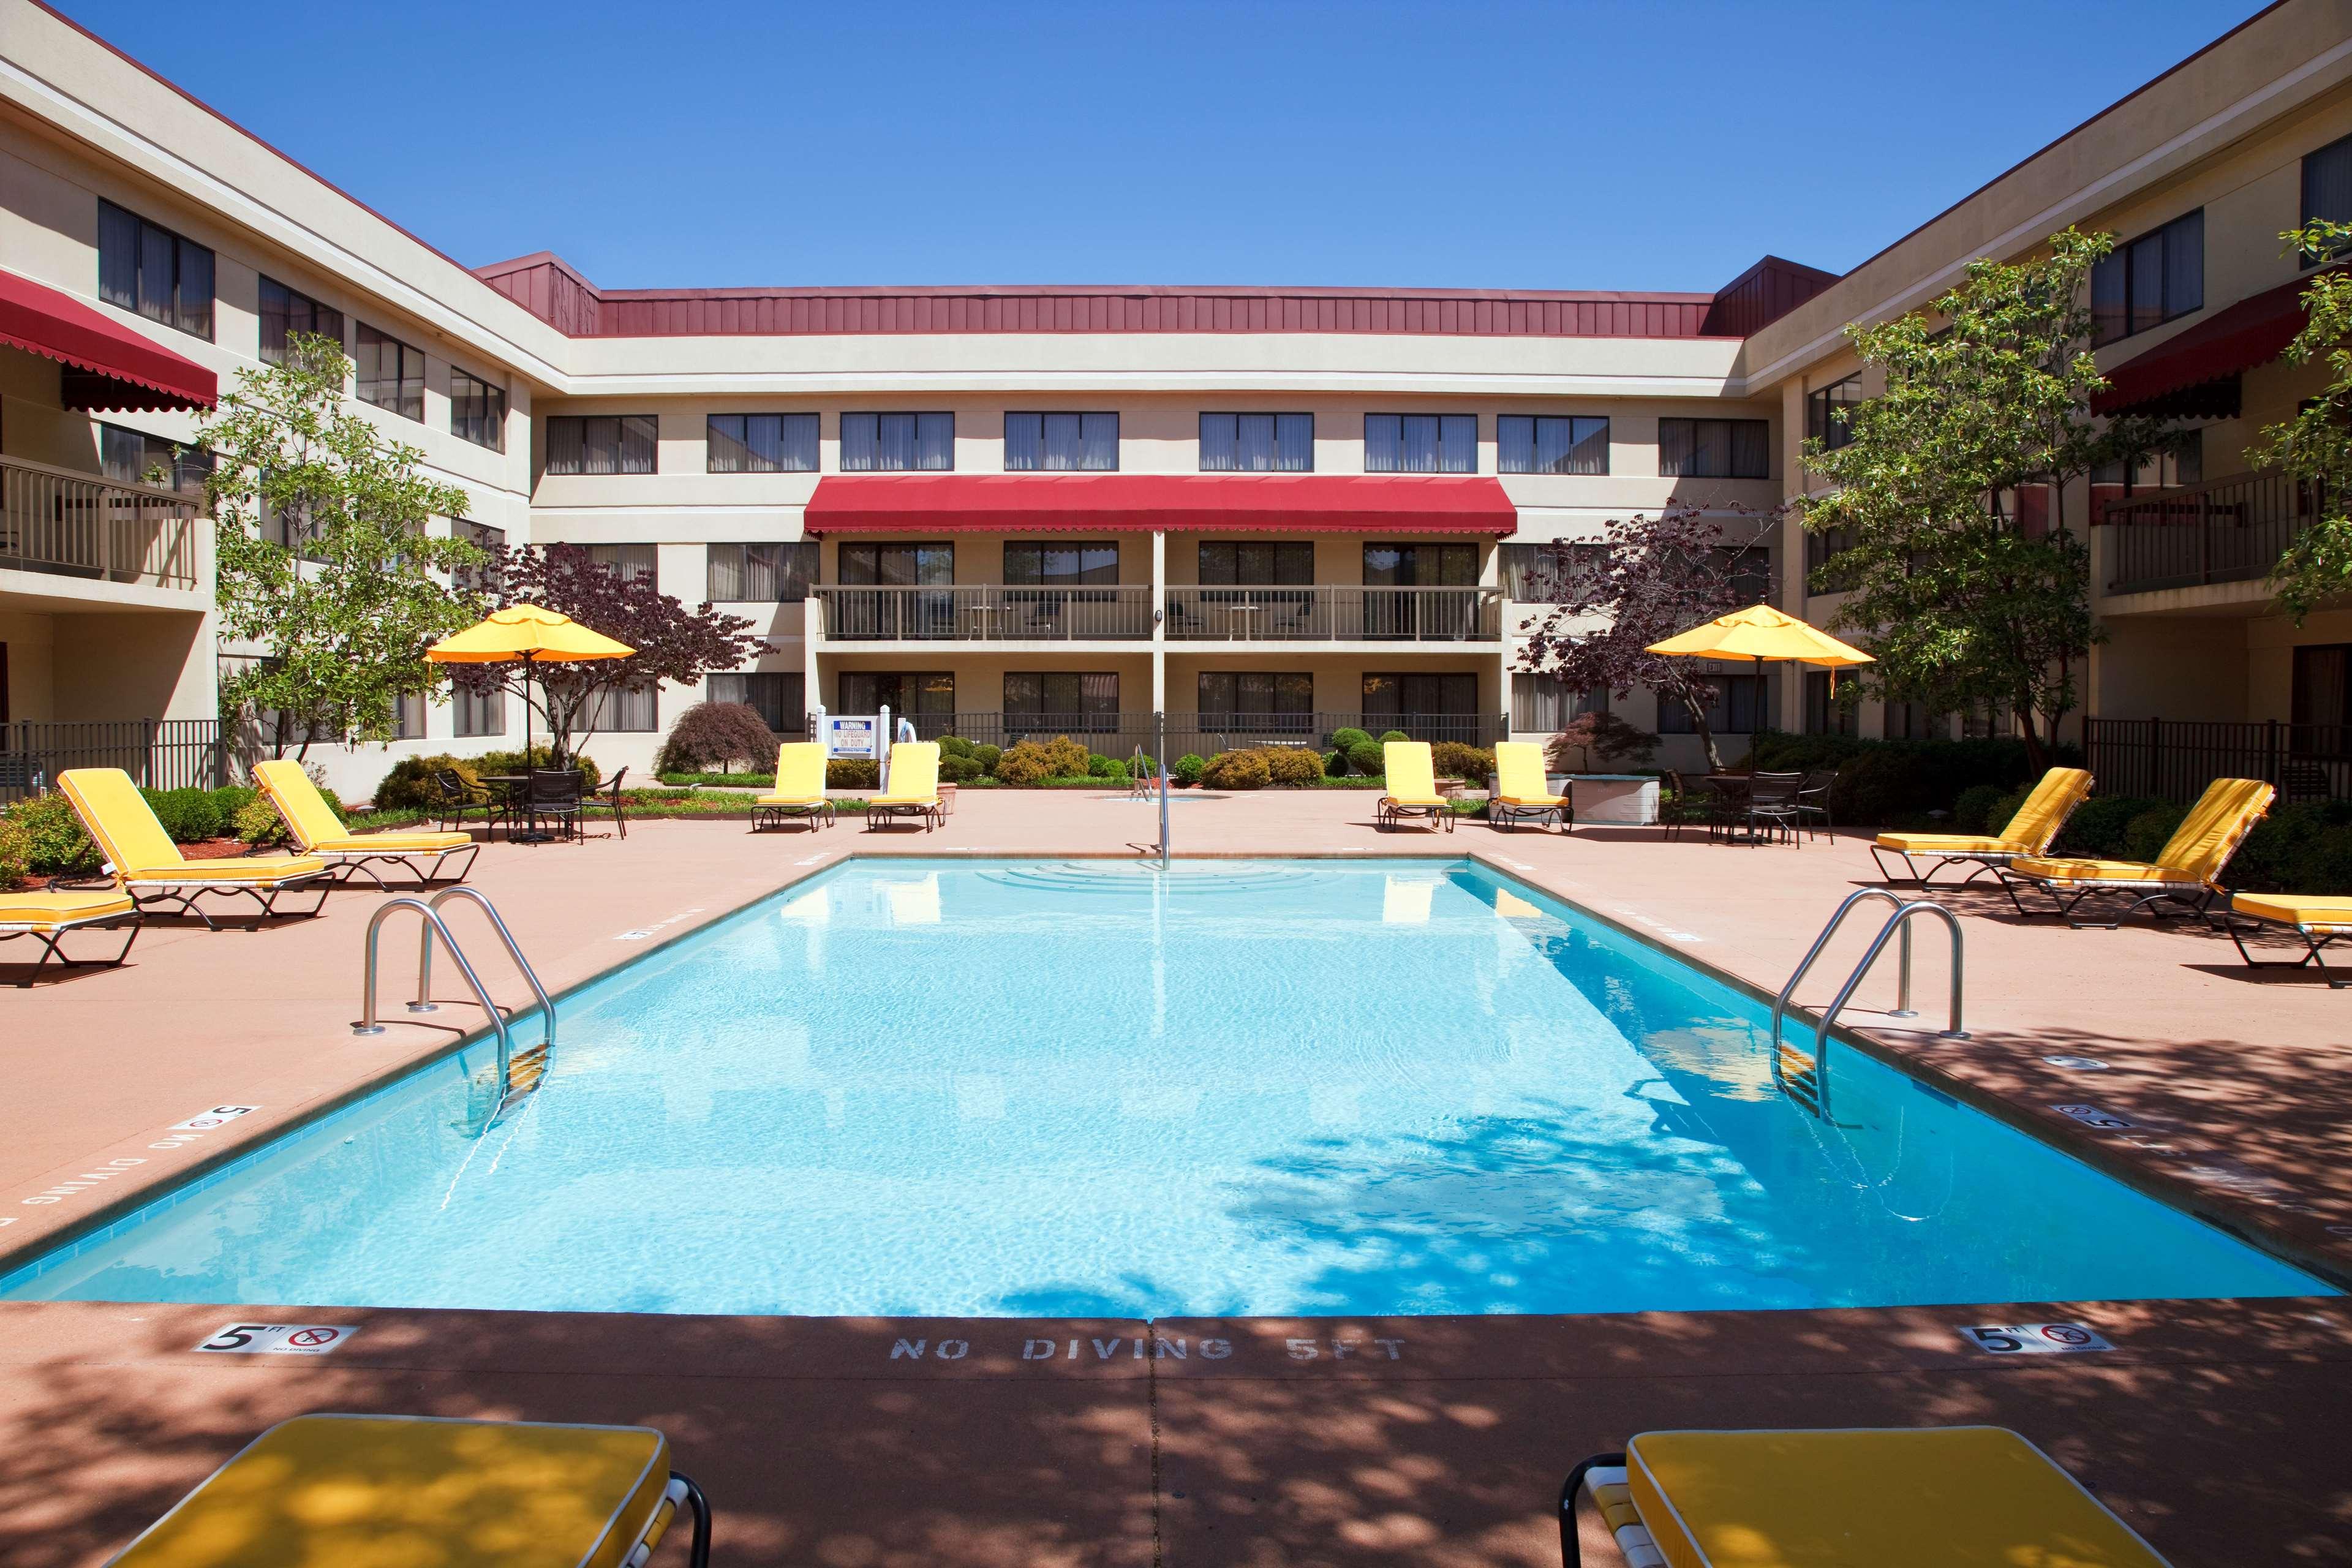 DoubleTree Suites by Hilton Hotel Cincinnati - Blue Ash image 2